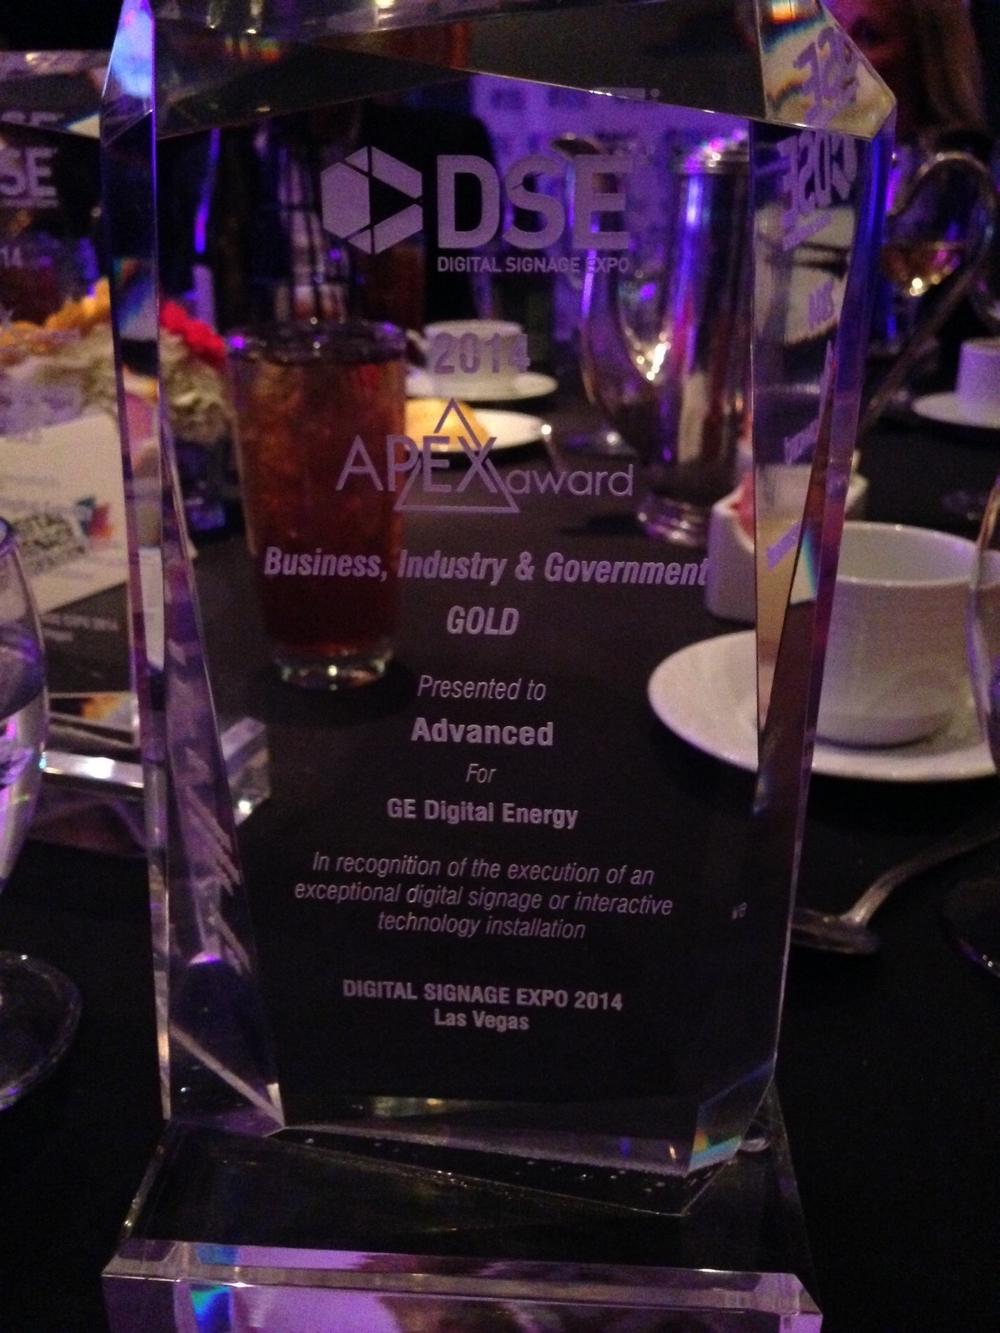 Apex Awards.jpg